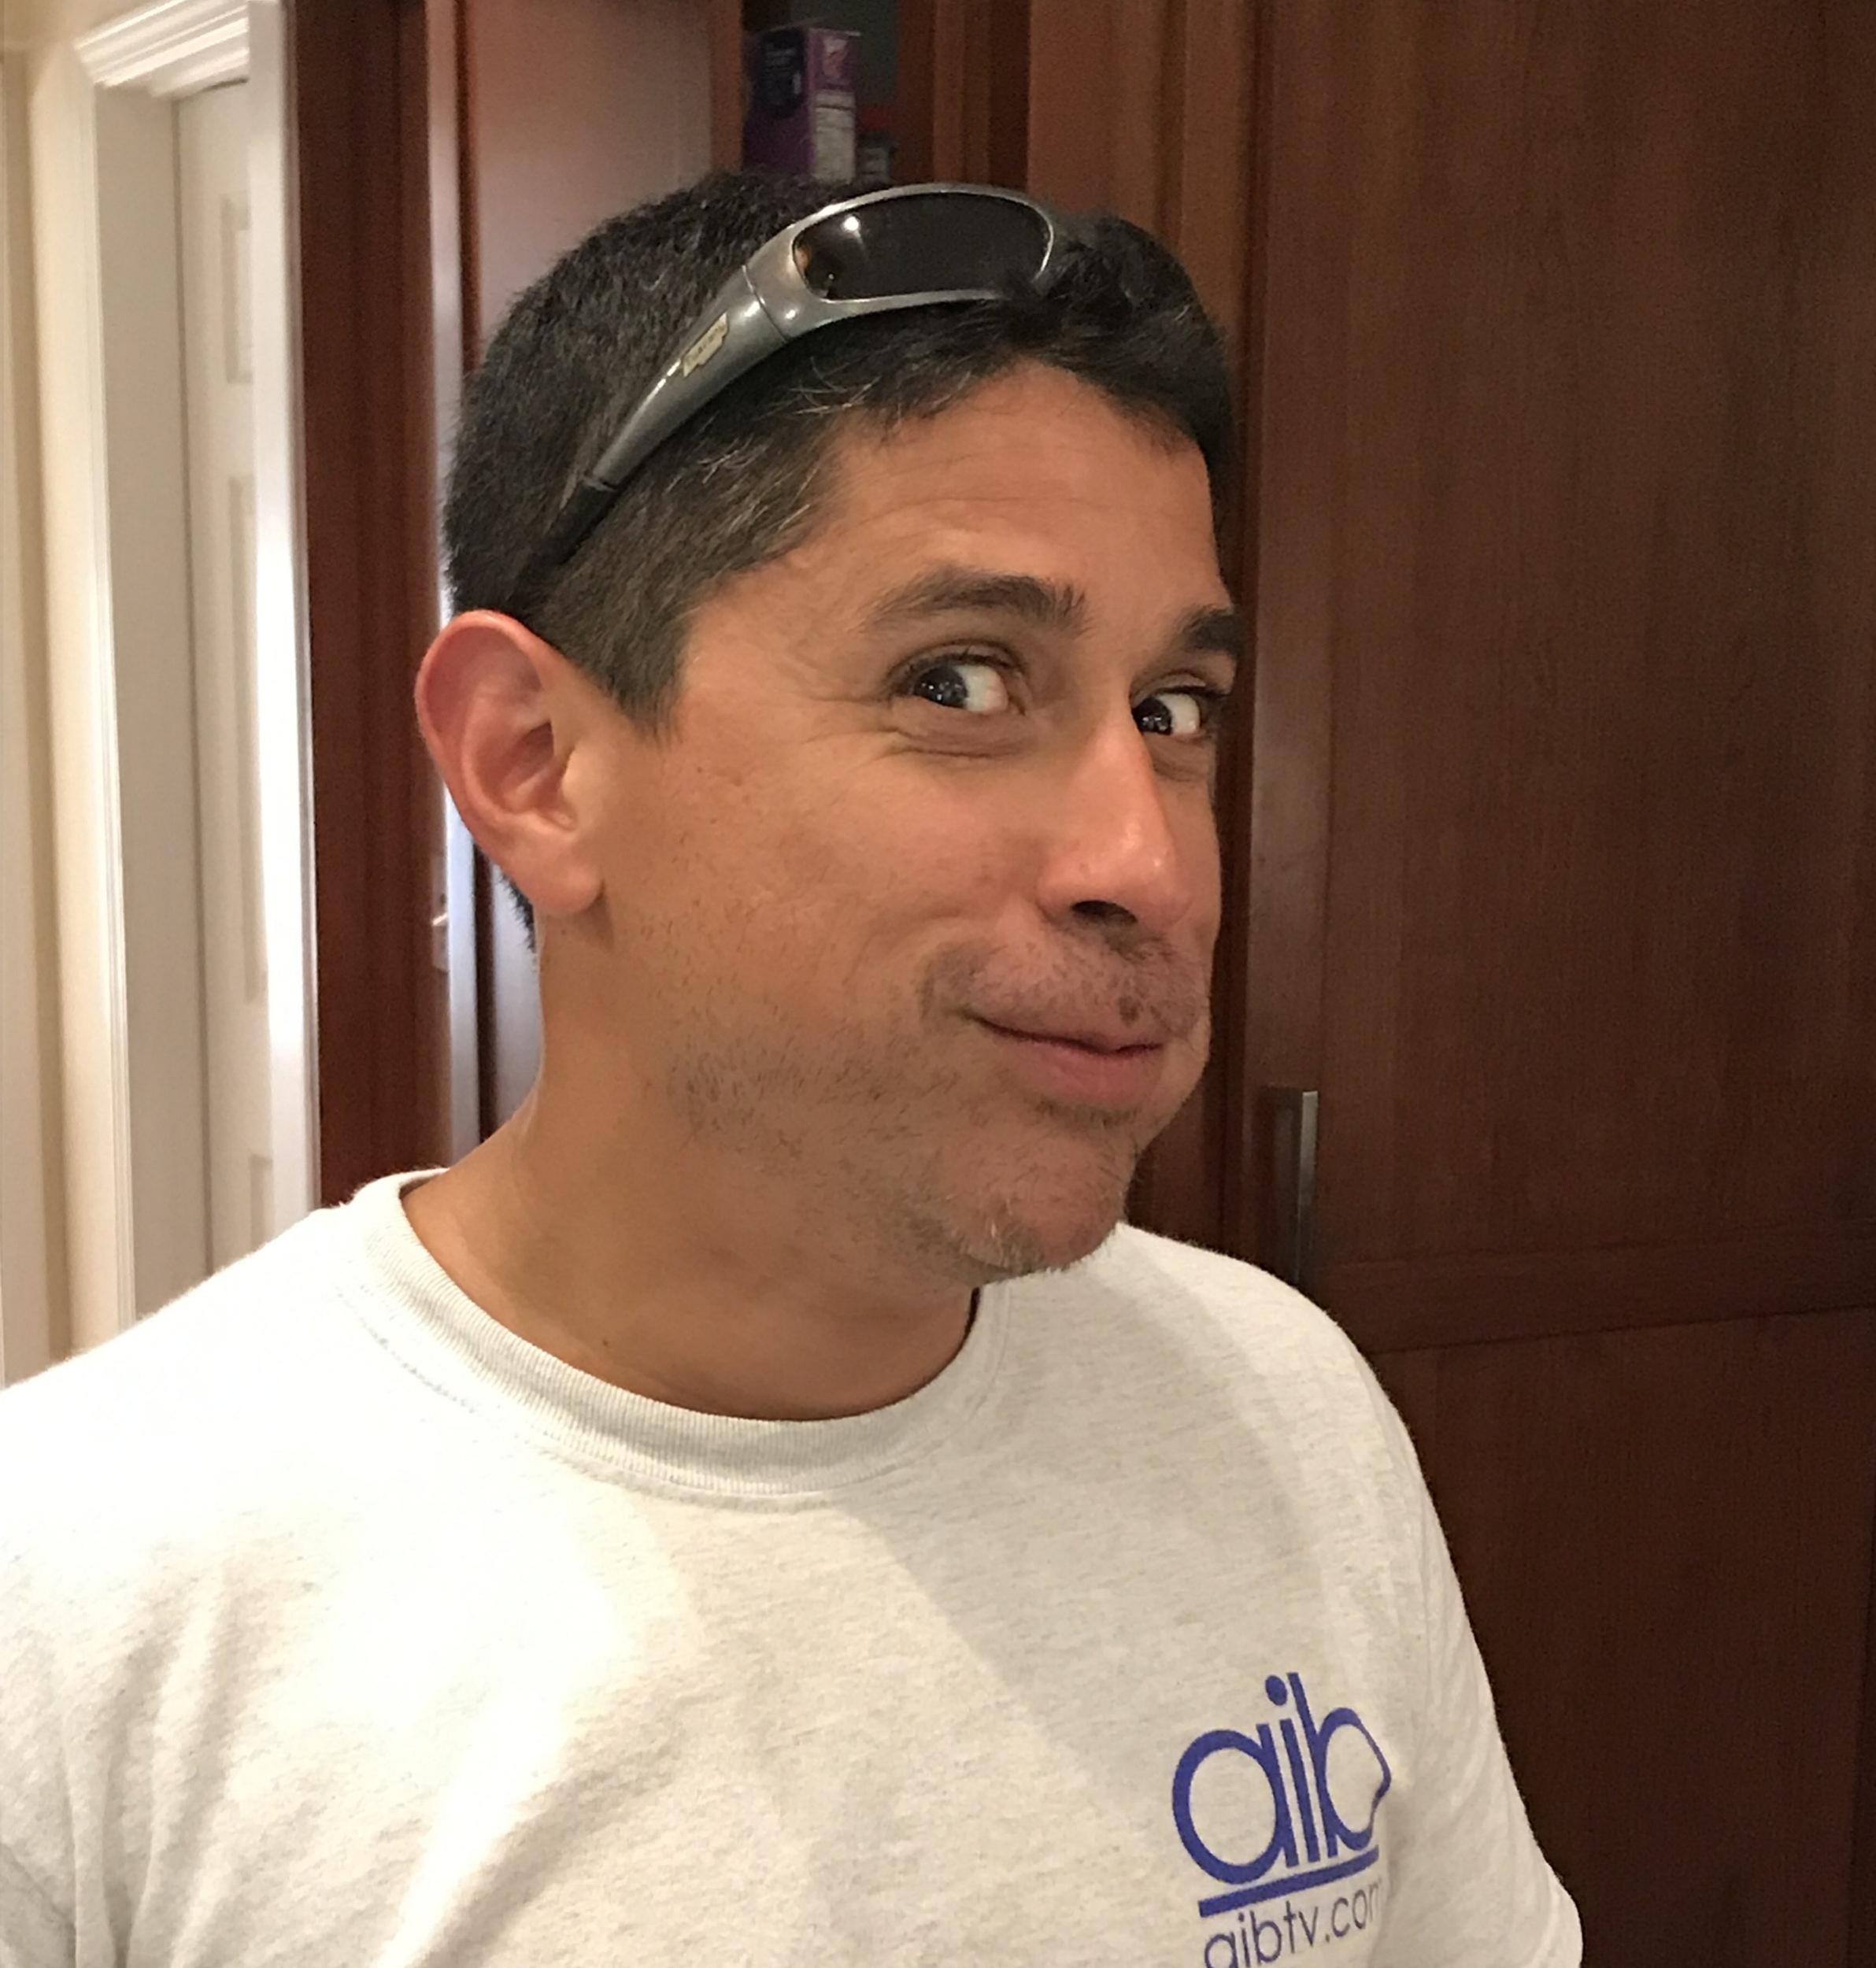 AIB Producer Edwin Rosado Tastes the Pork Belly